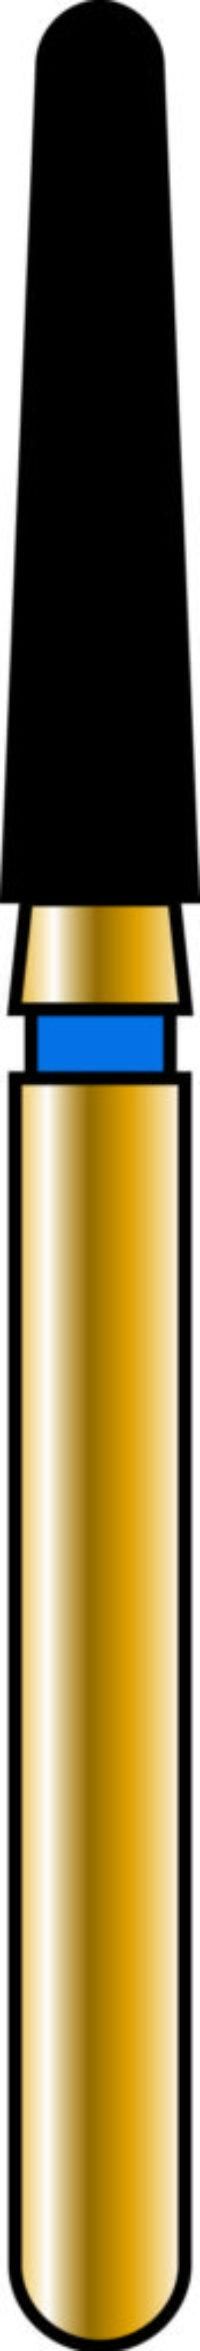 Round End Taper 18-8mm Gold Diamond Bur